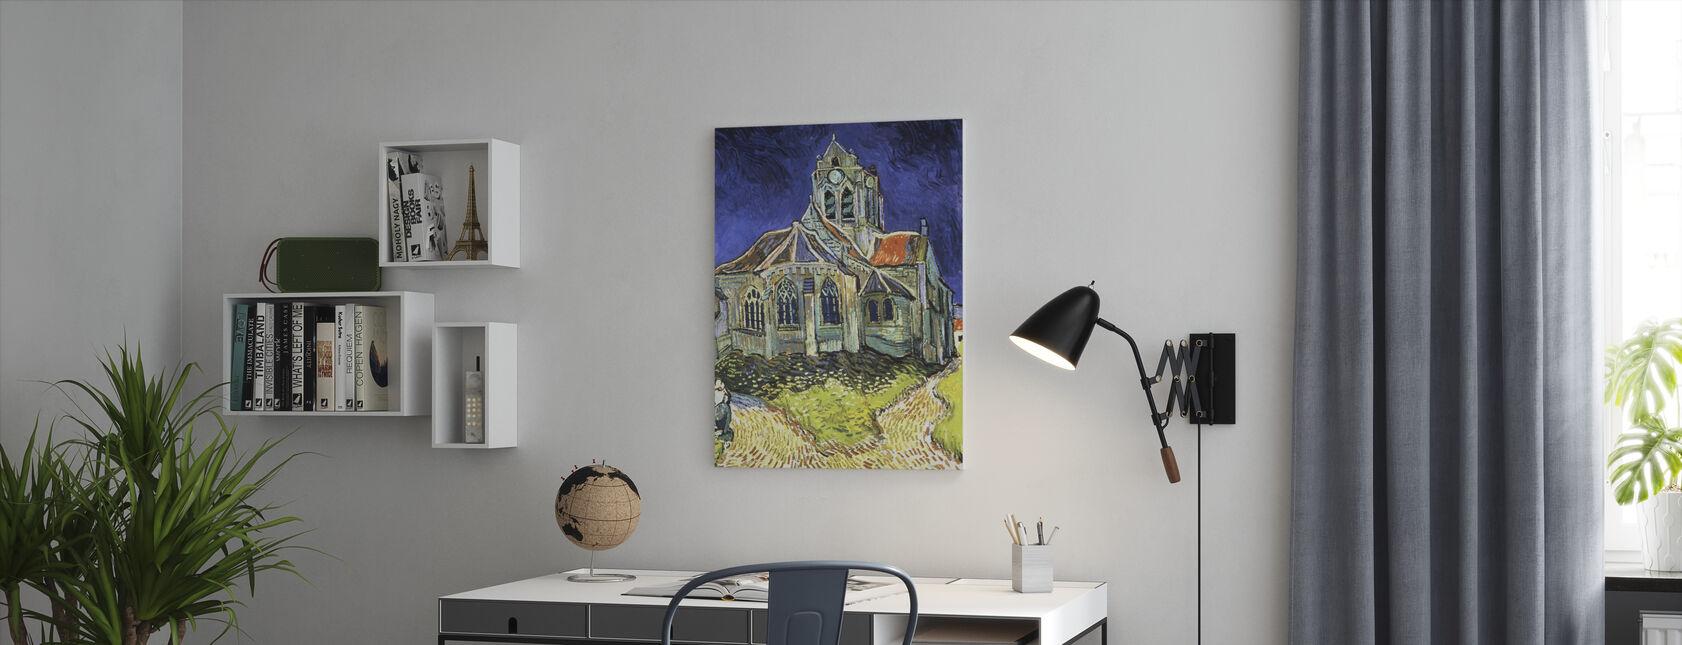 Kyrkan vid Auvers-sur-Oise - Vincent van Gogh - Canvastavla - Kontor